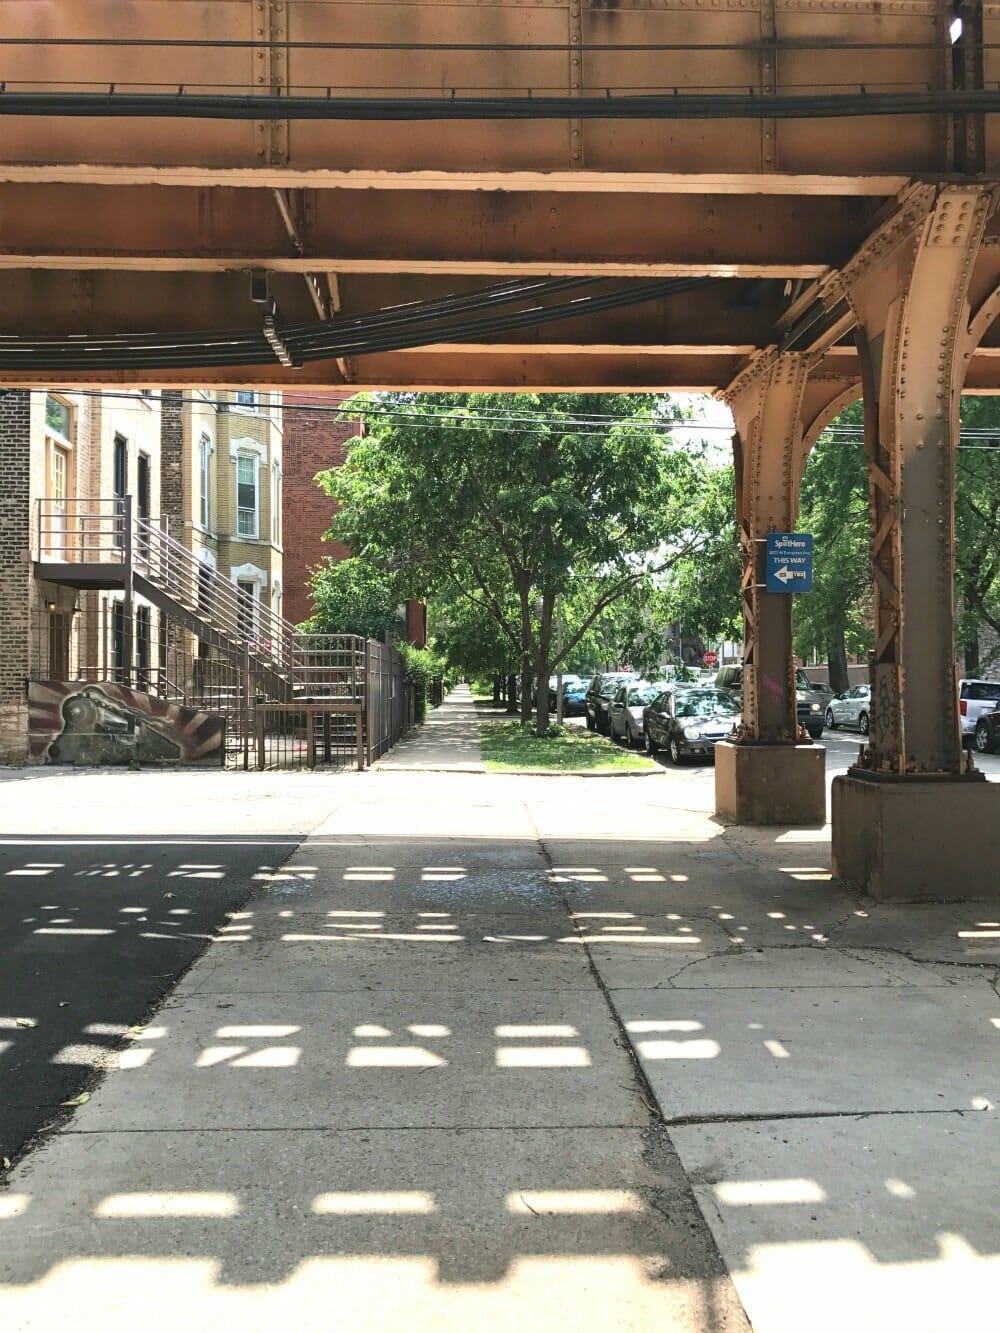 Exploring Wicker Park - streets